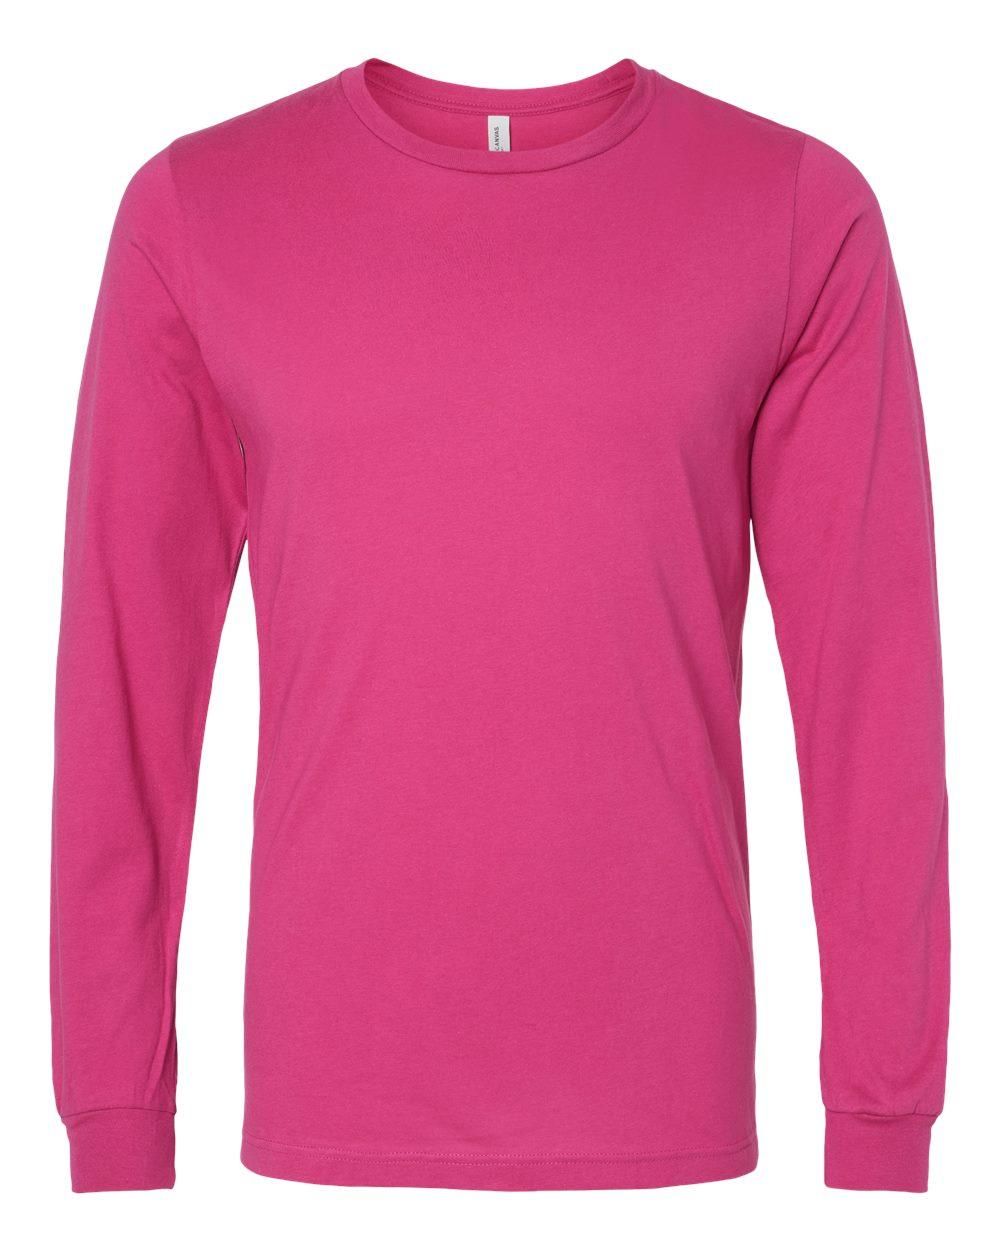 Bella-Canvas-Mens-Blank-Top-Long-Sleeve-Jersey-Tee-T-Shirt-3501-up-to-3XL thumbnail 21